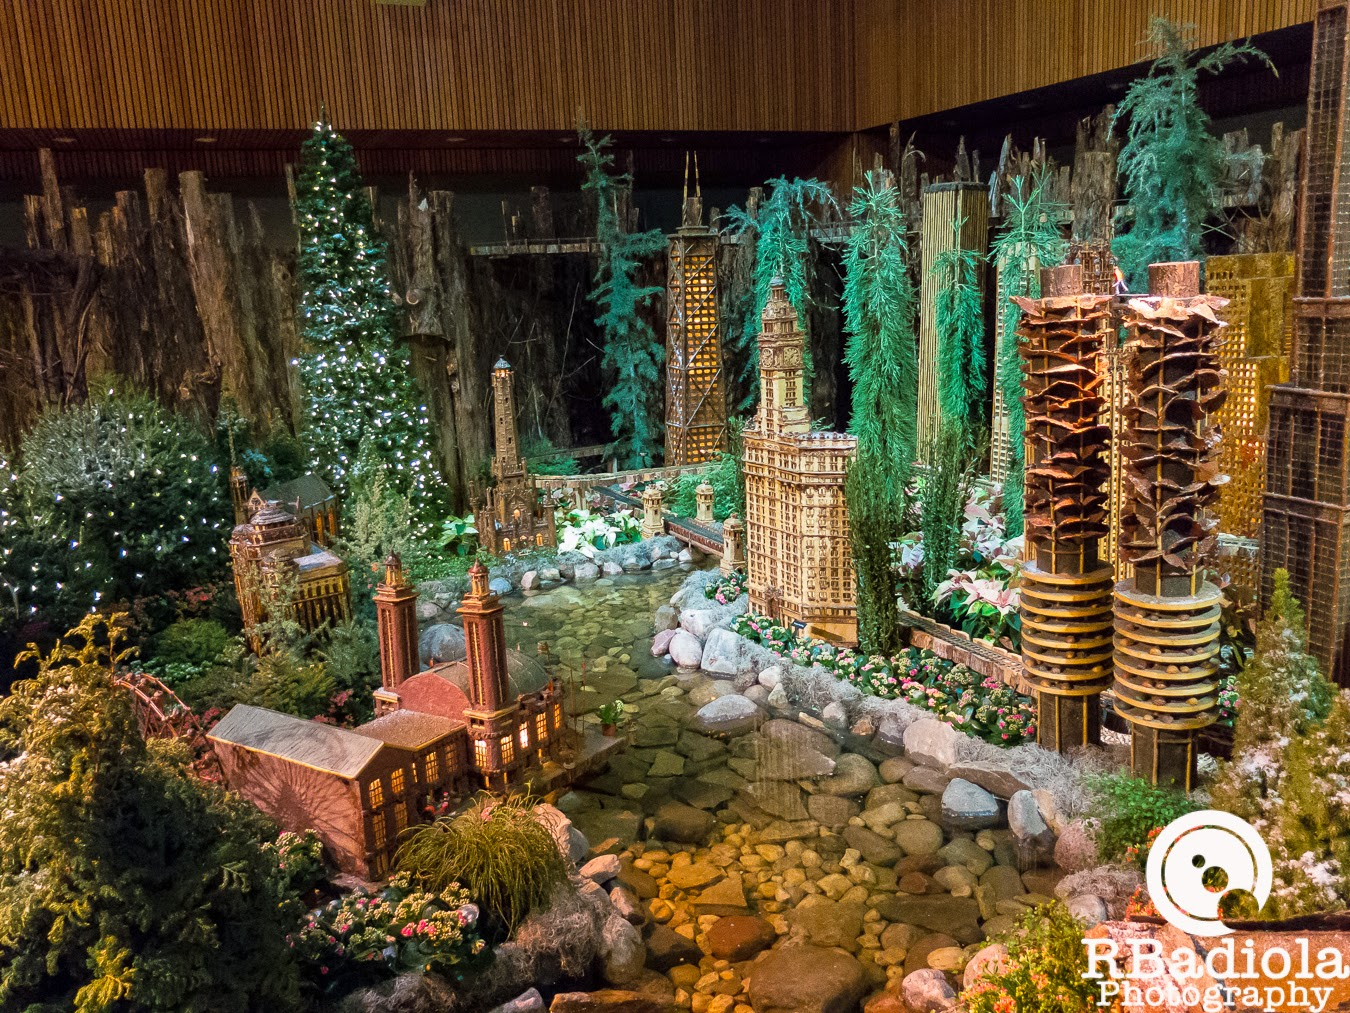 Me And My Aperture The Chicago Botanic Garden Wonderland Express